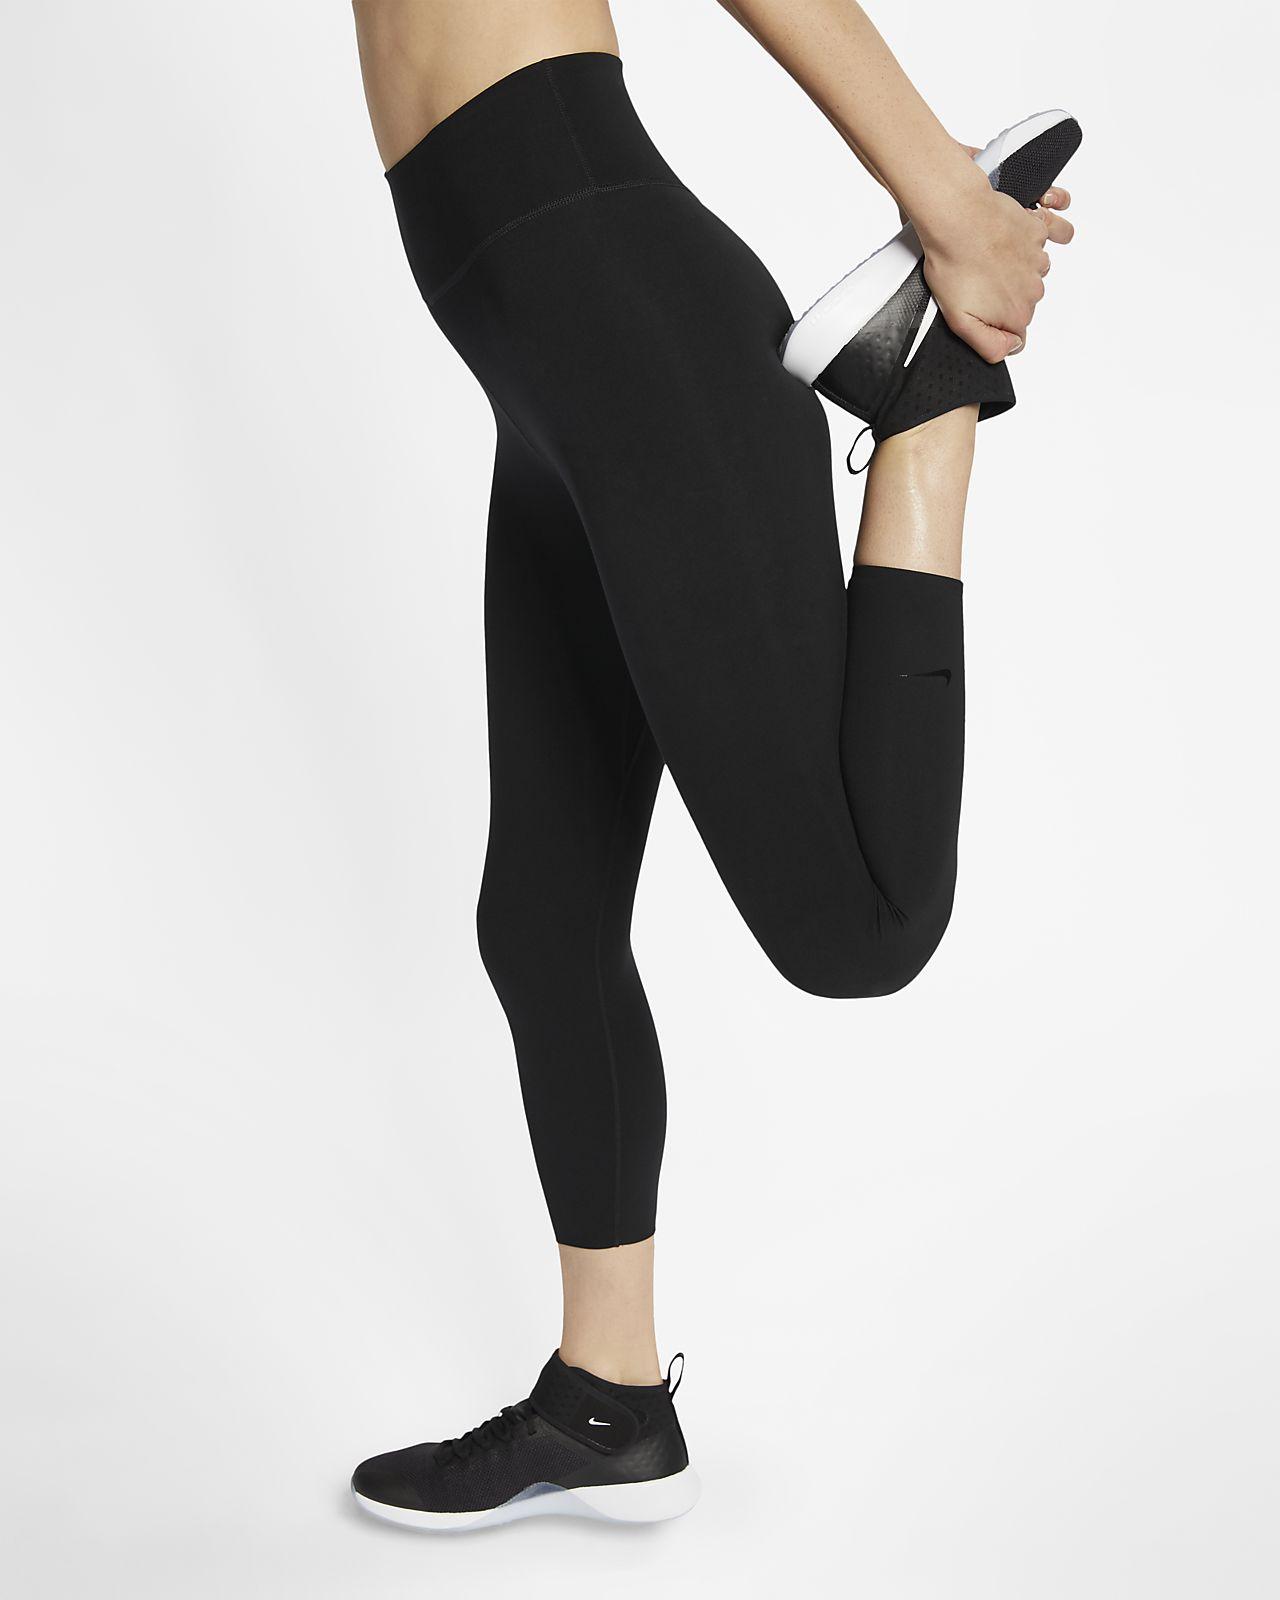 Nike One Luxe Women's Training Crops